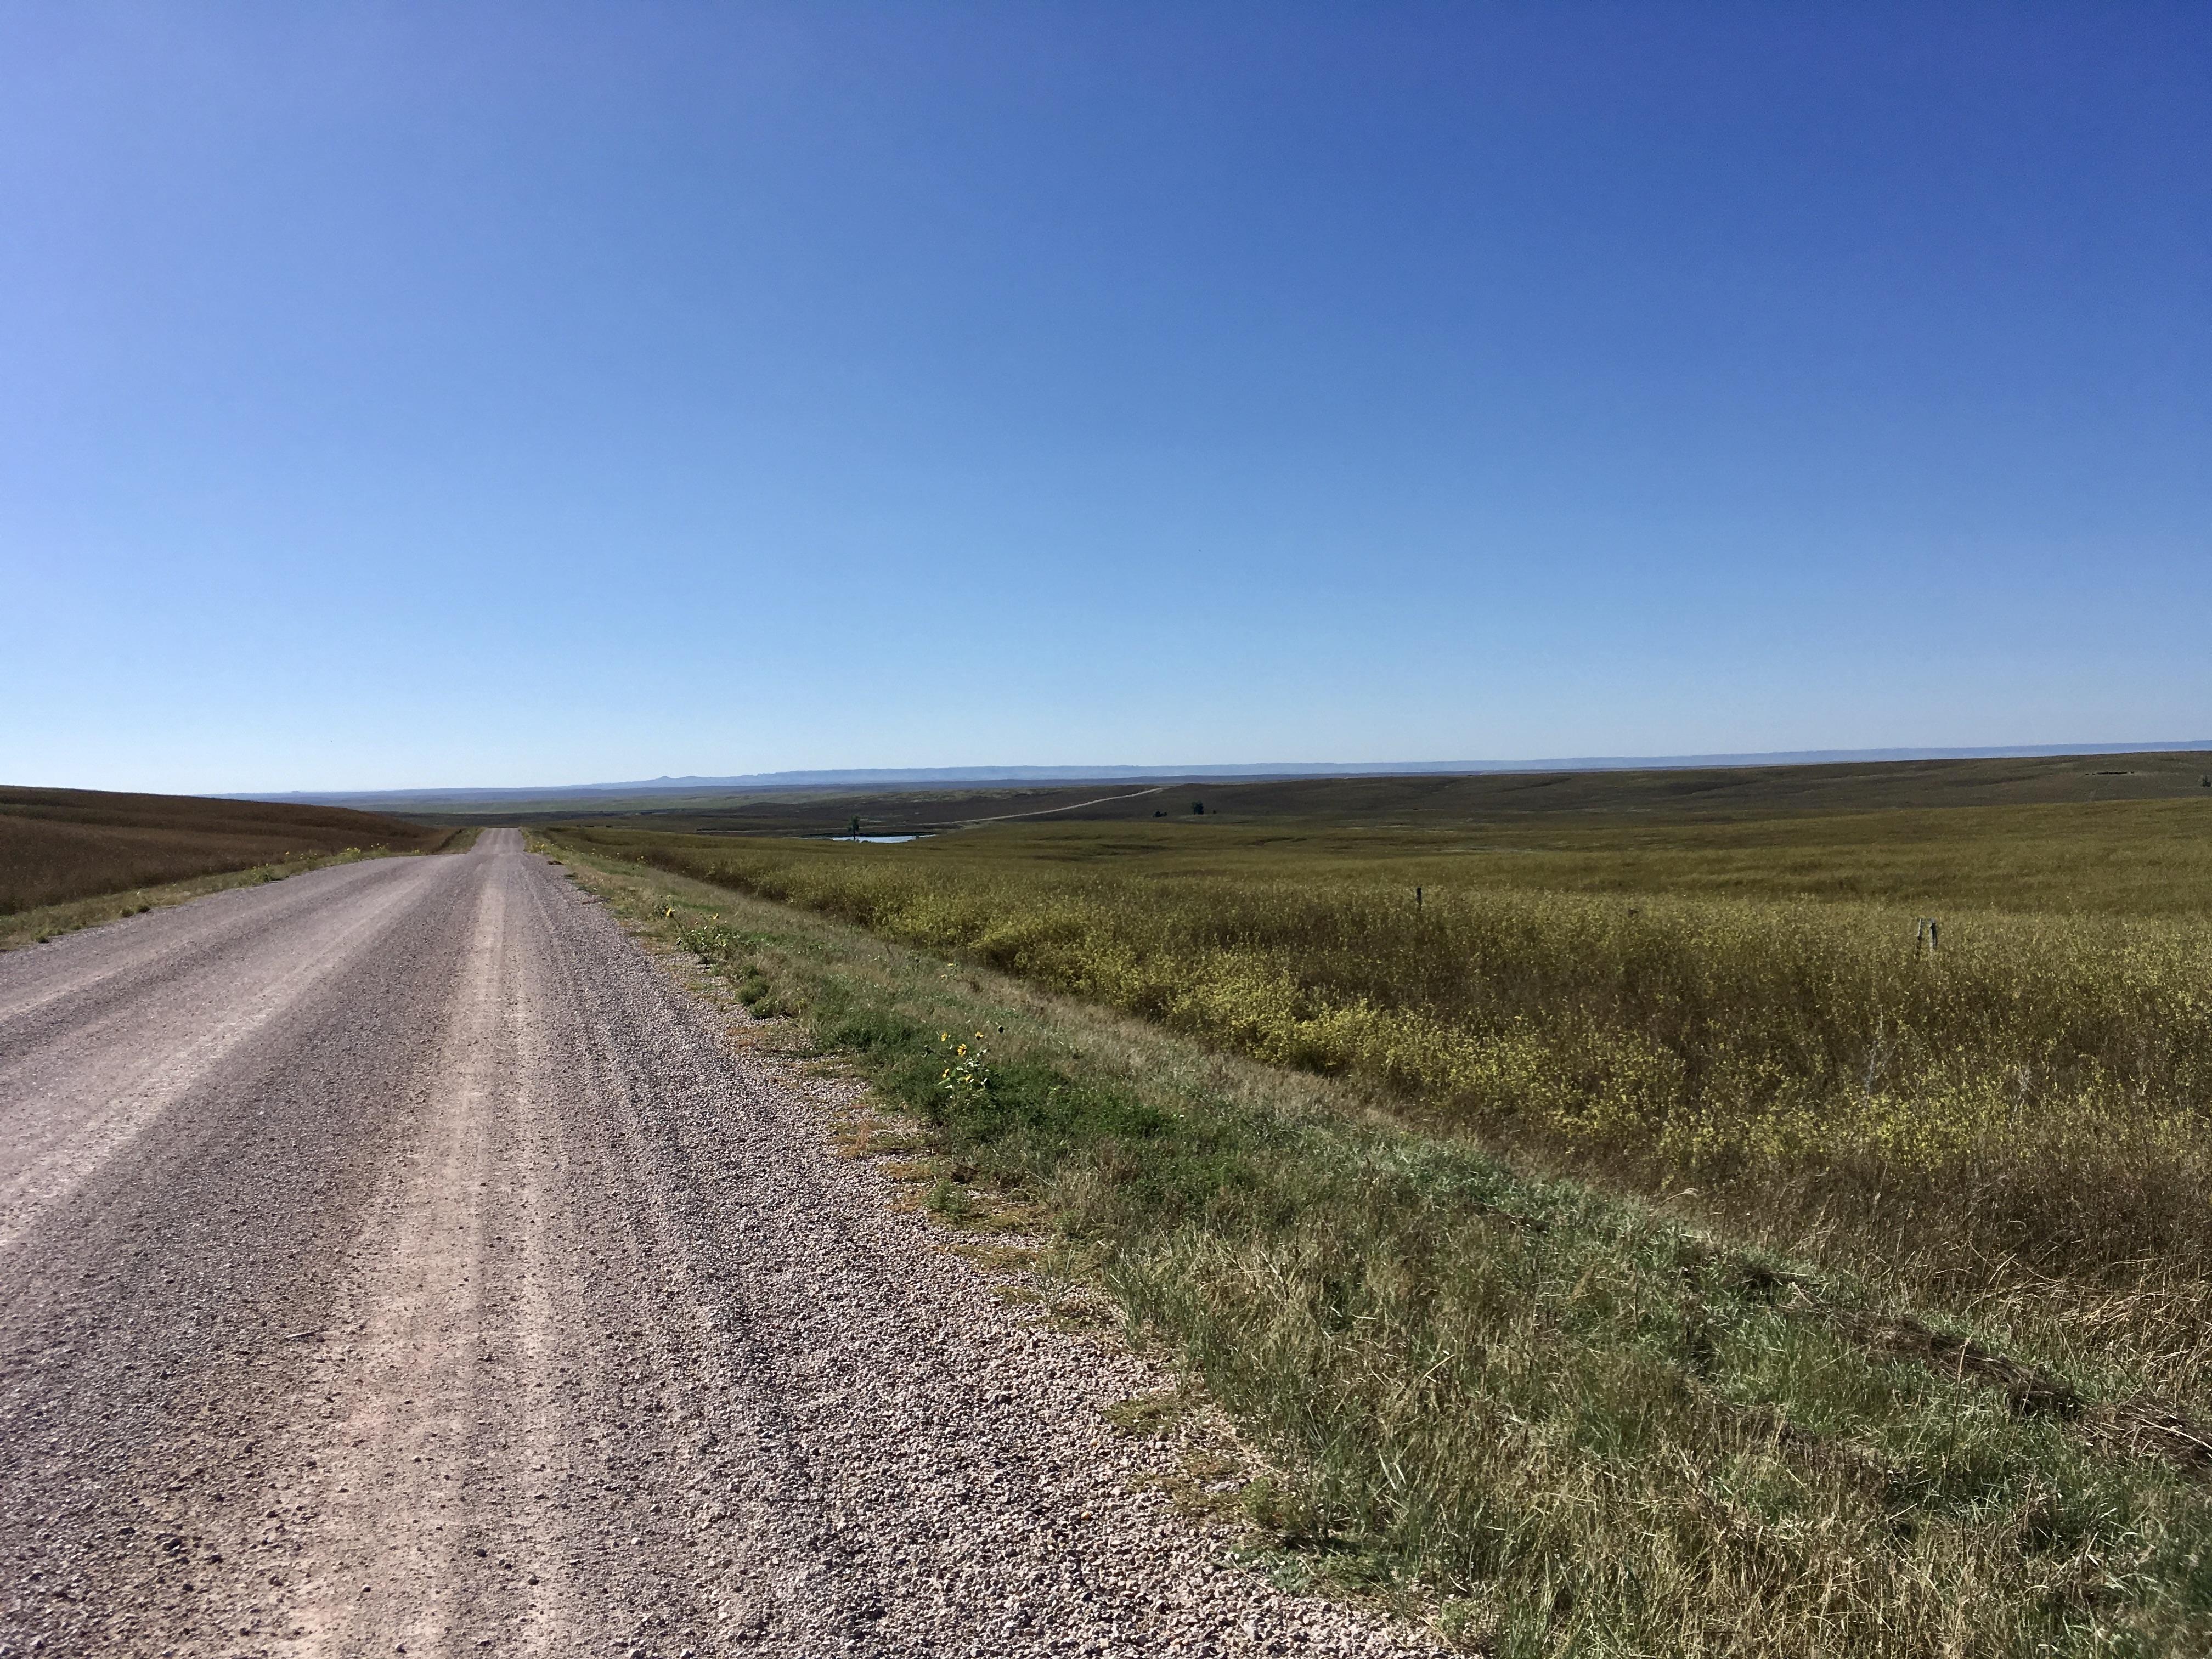 Long, straight road from Edgemont, SD into Nebraska